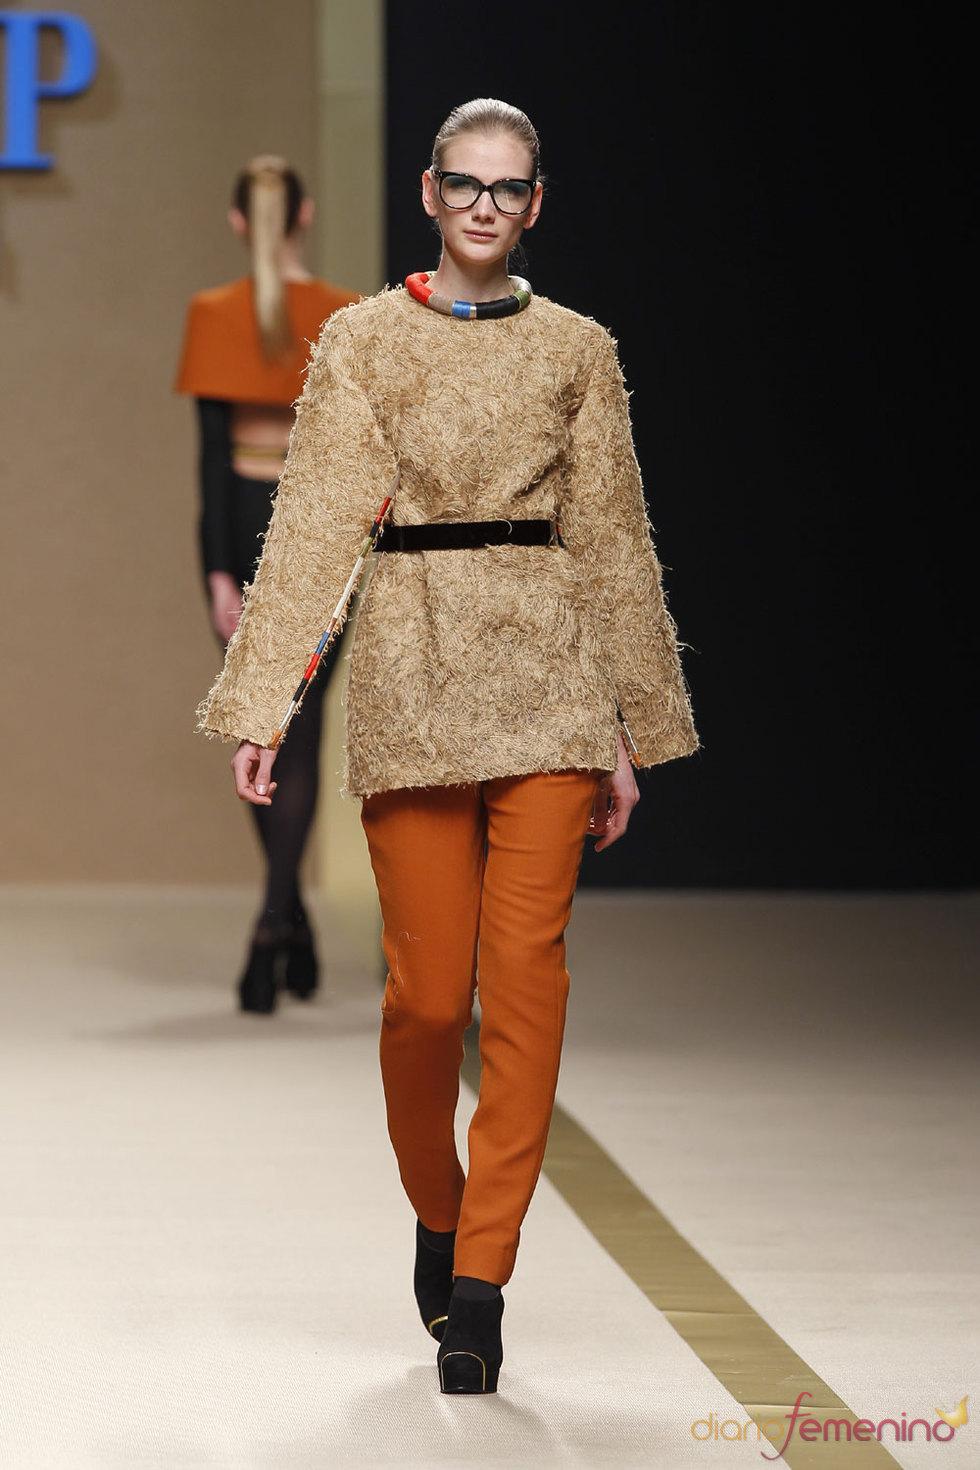 Moda femenina 2010 - Jesús del Pozo - Cibeles Fashion Week